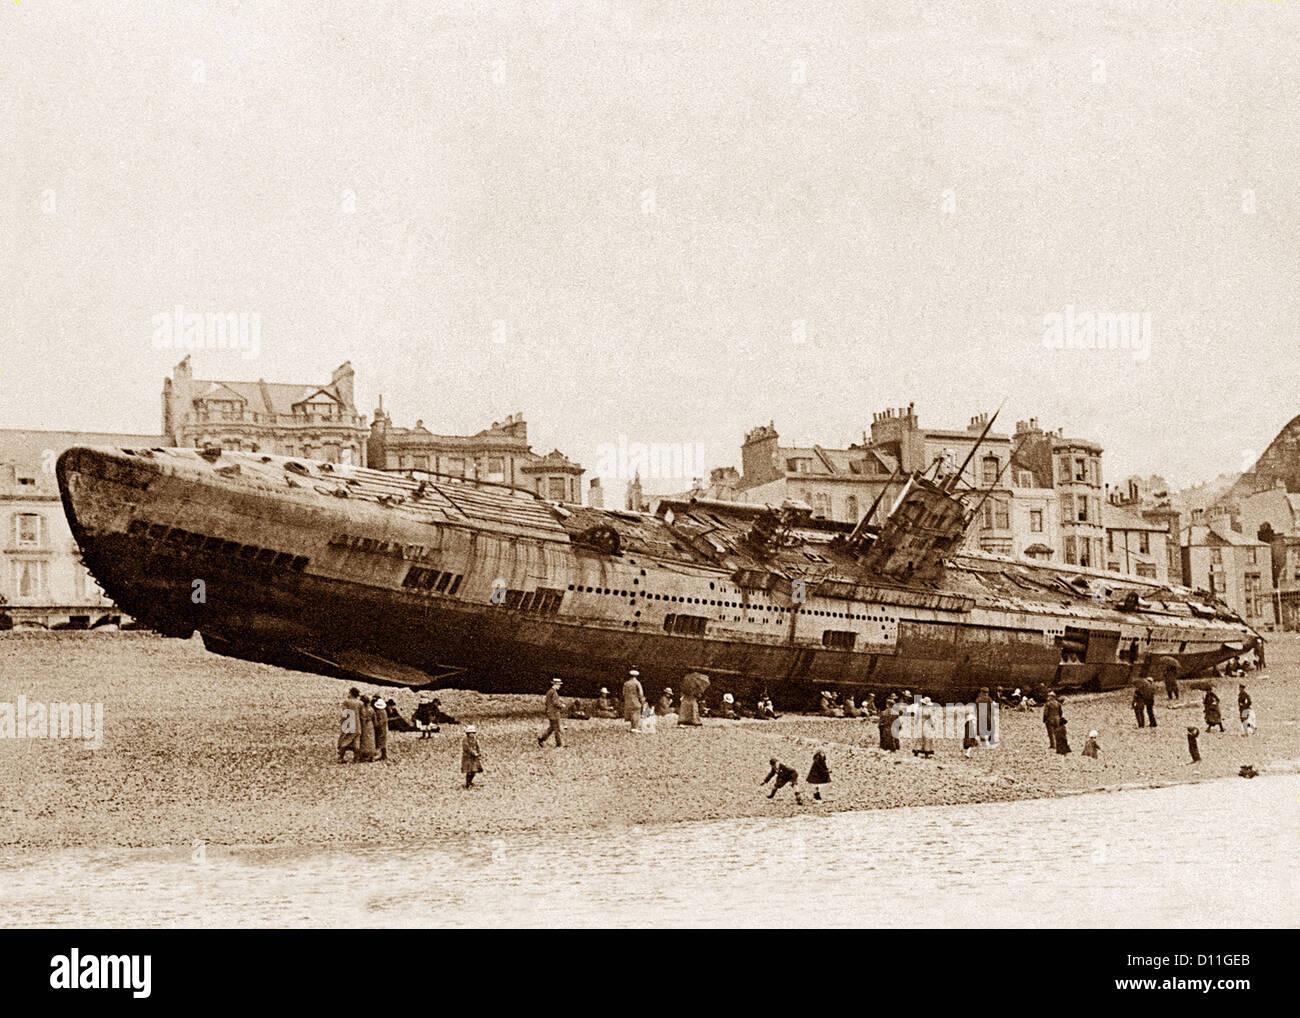 Hastings beach, German submarine, 15th April 1919 - Stock Image